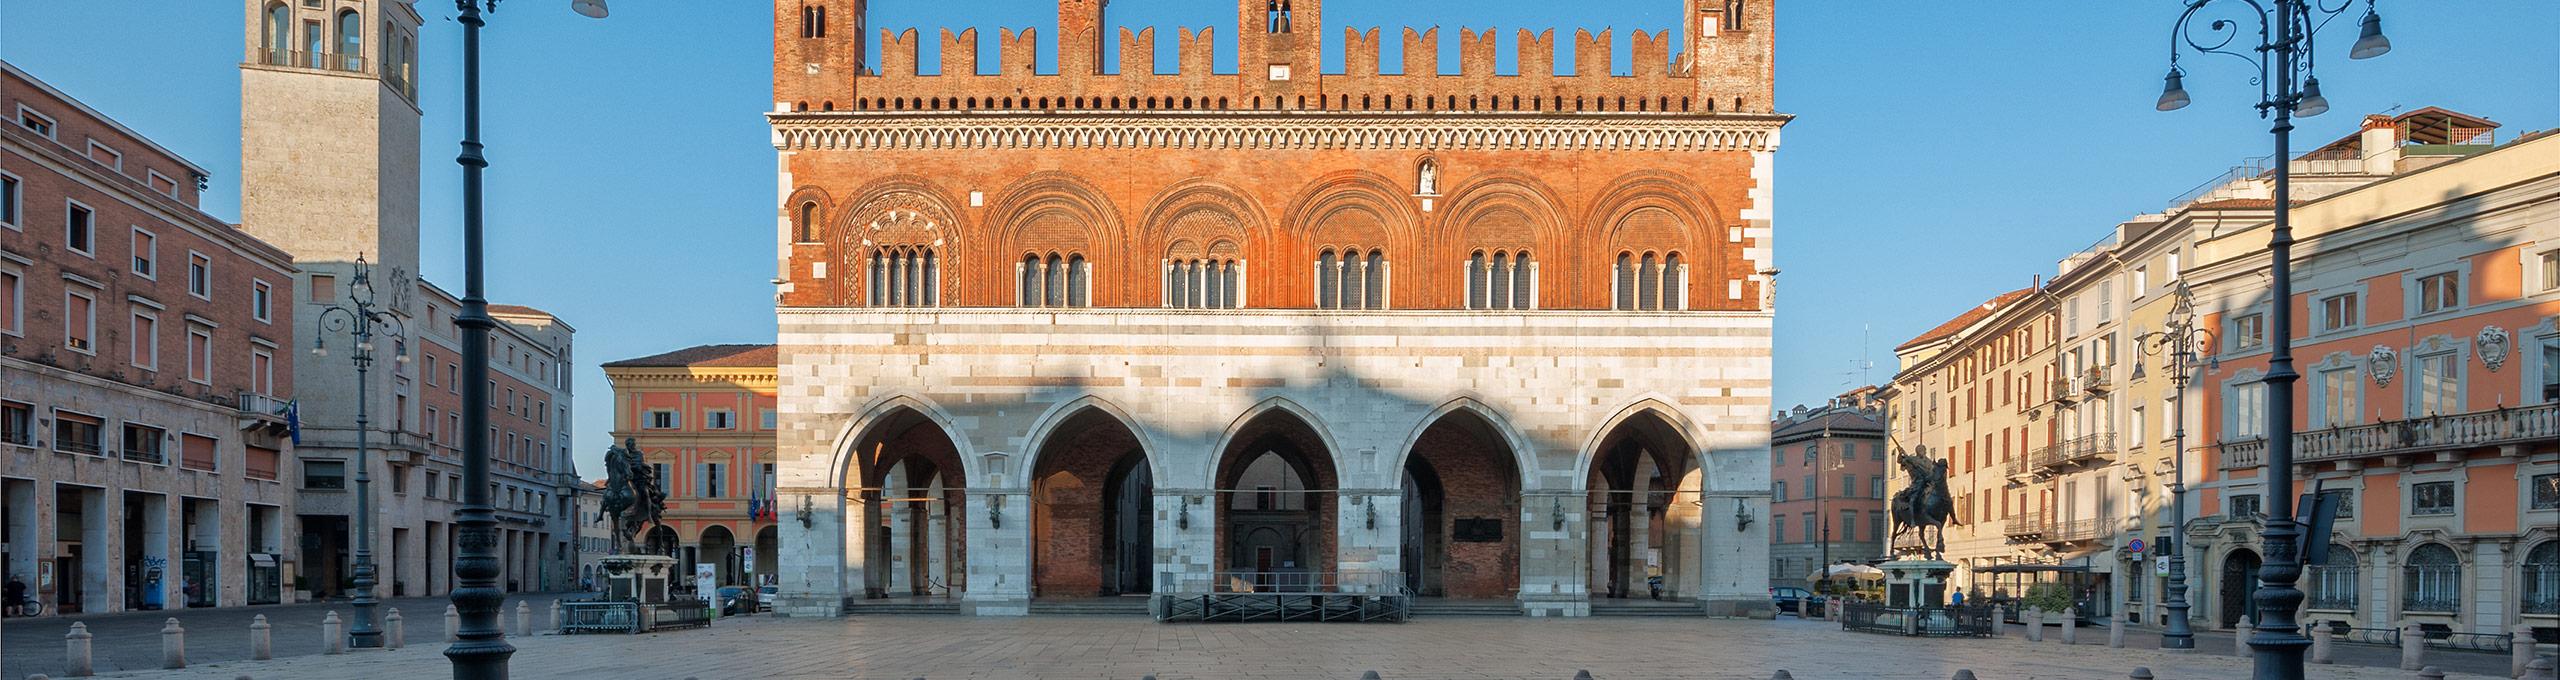 Piacenza Tourism: Best of Piacenza